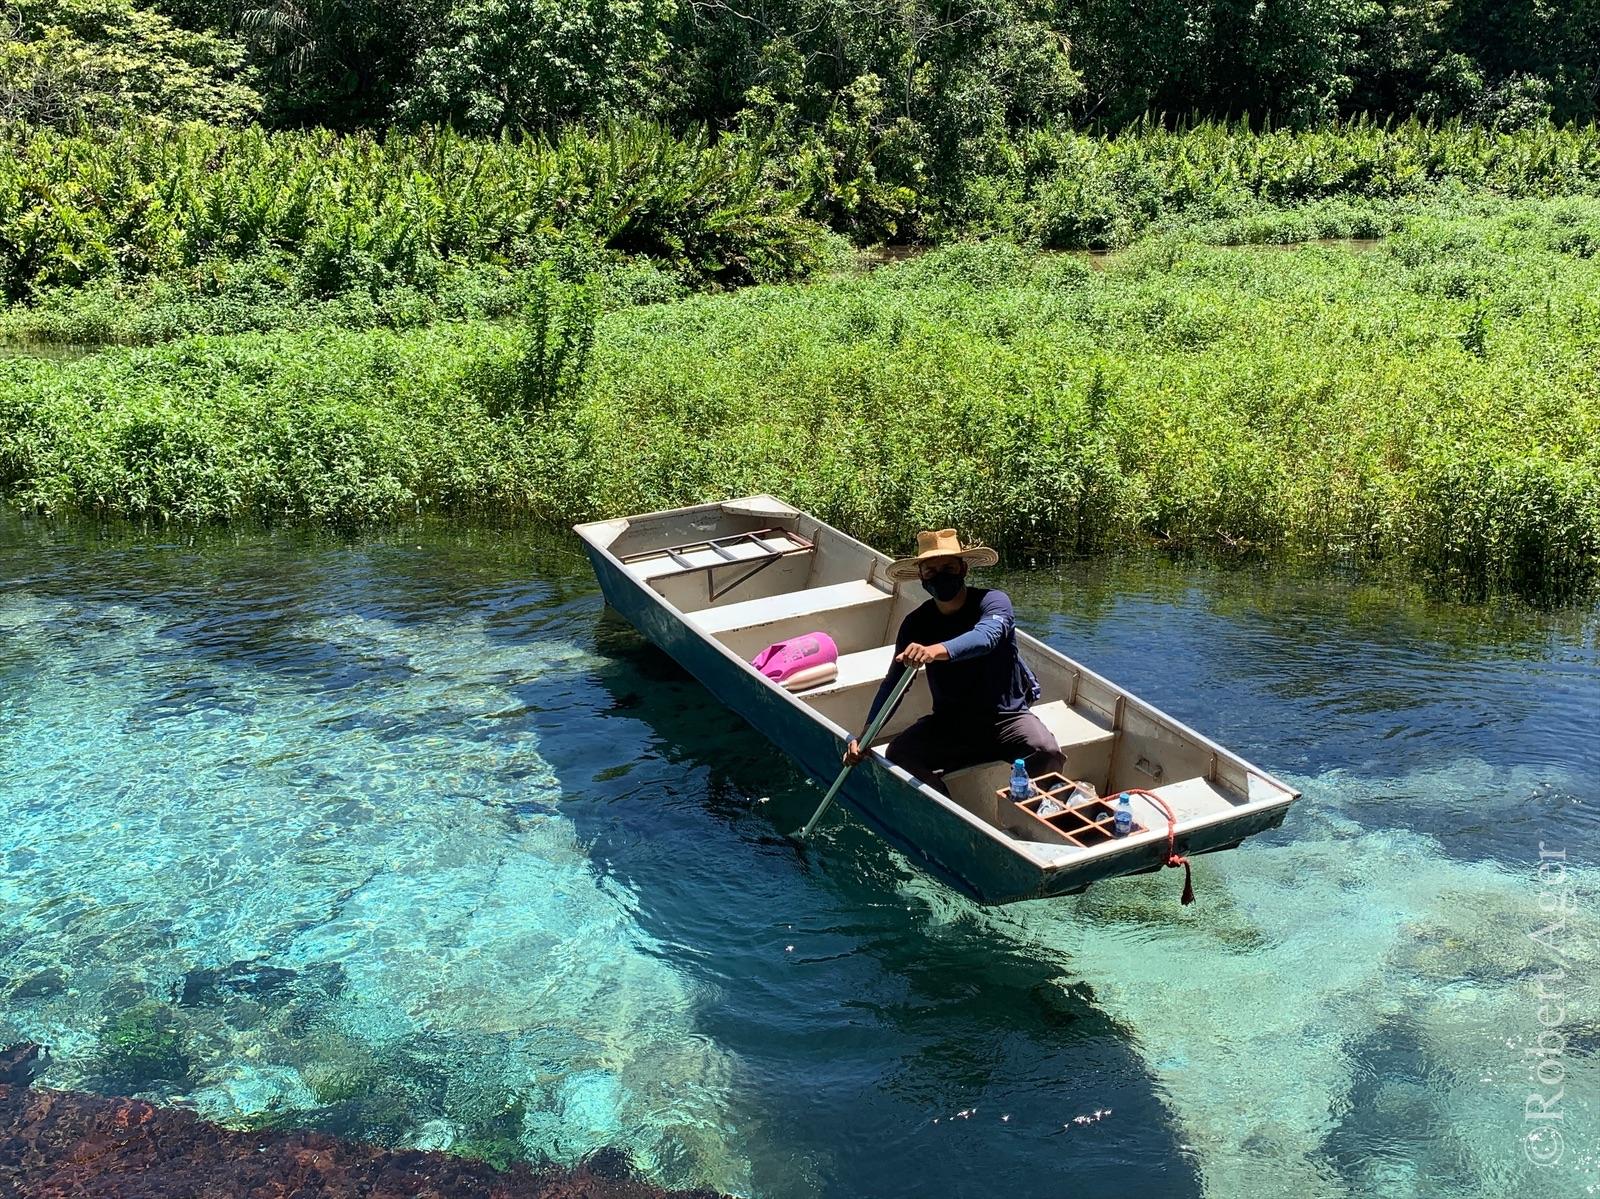 053_Overlander_Gaia_Pantanal